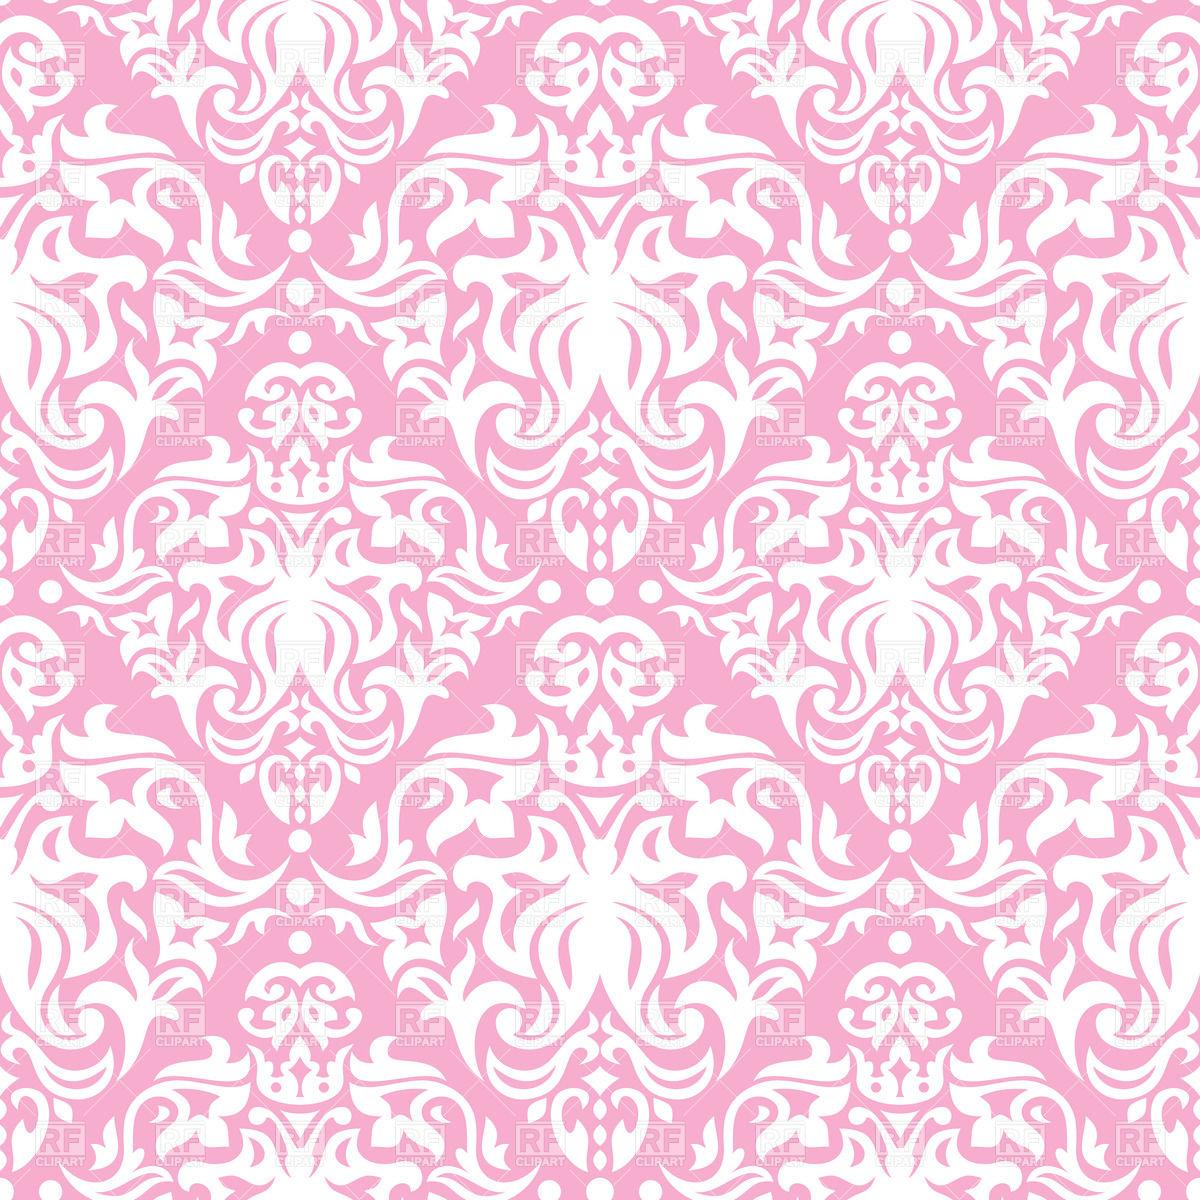 Wave Wall Murals White And Pink Wallpaper Wallpapersafari